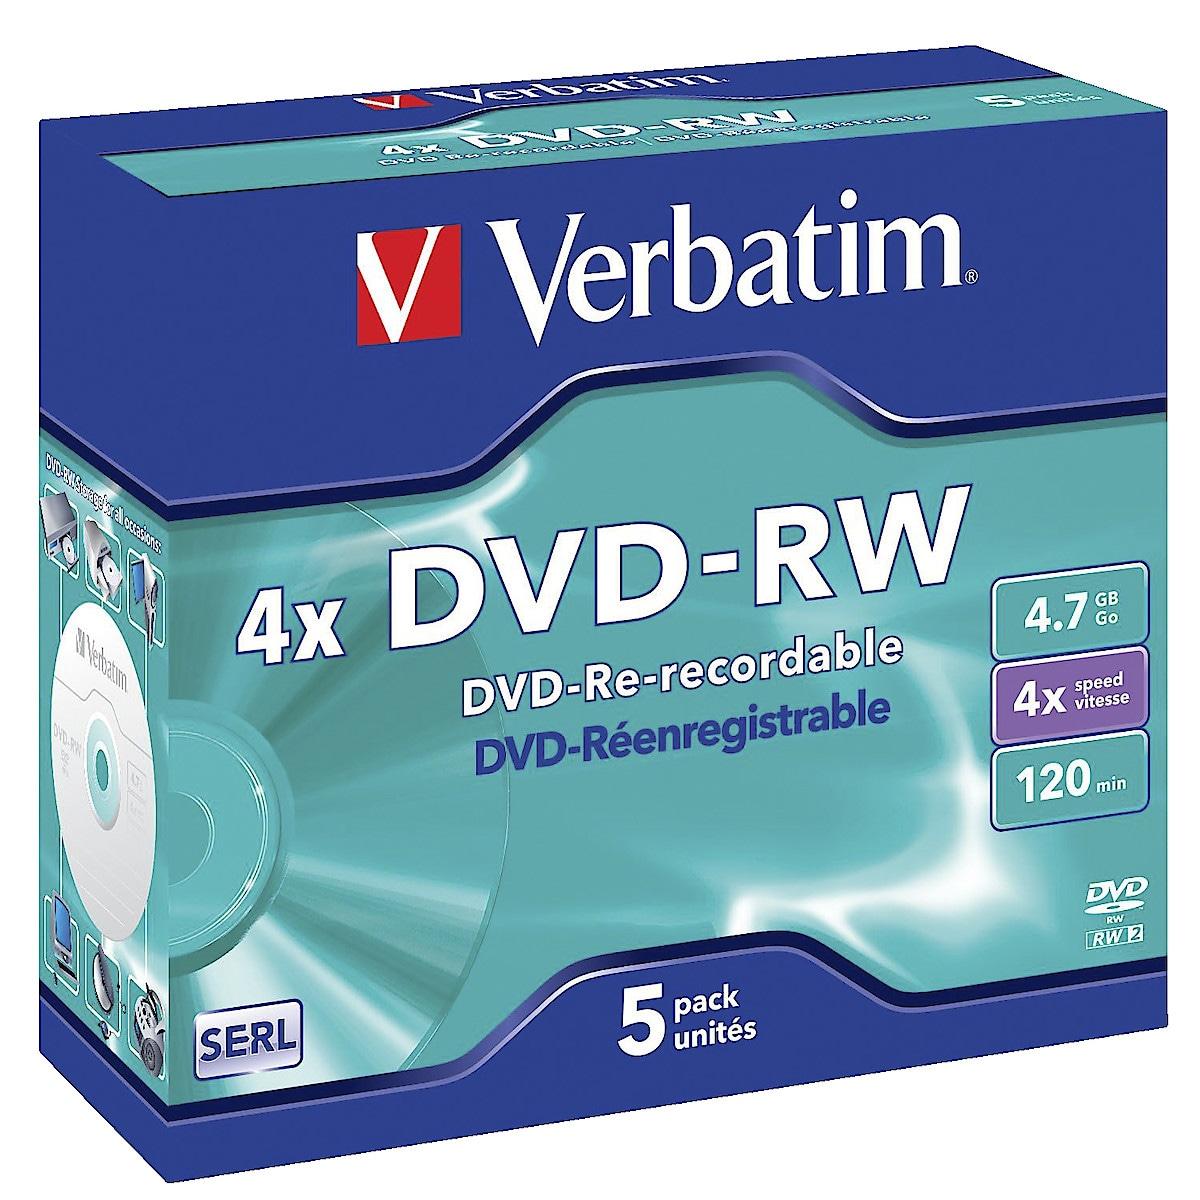 DVD RW, 4.7 GB